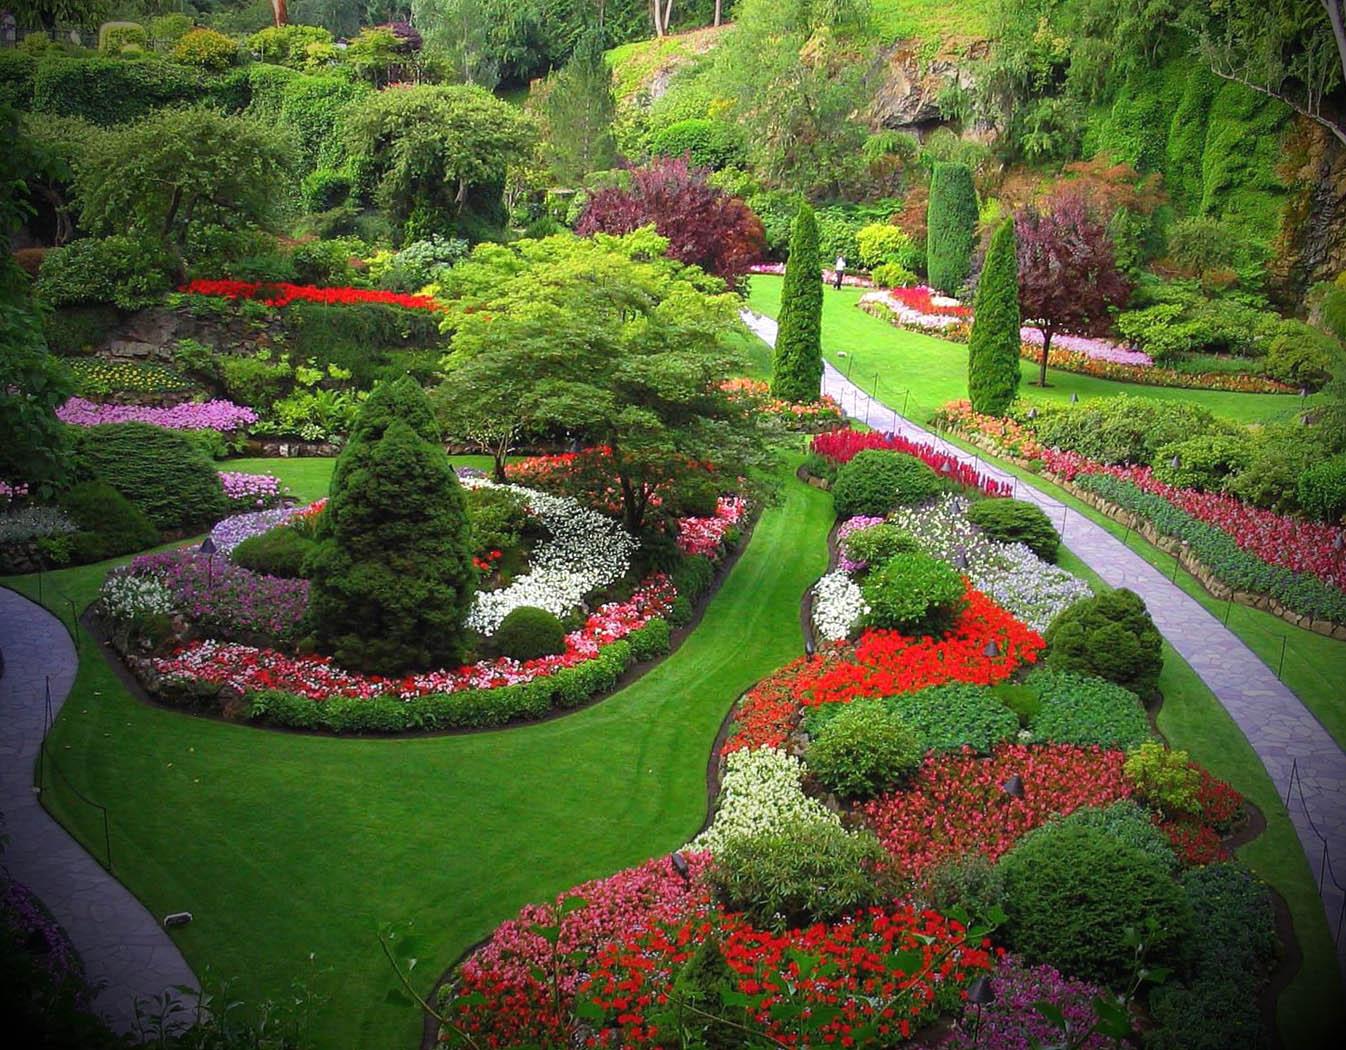 ideias jardim exterior:Fotos de Jardins Externos Decorados